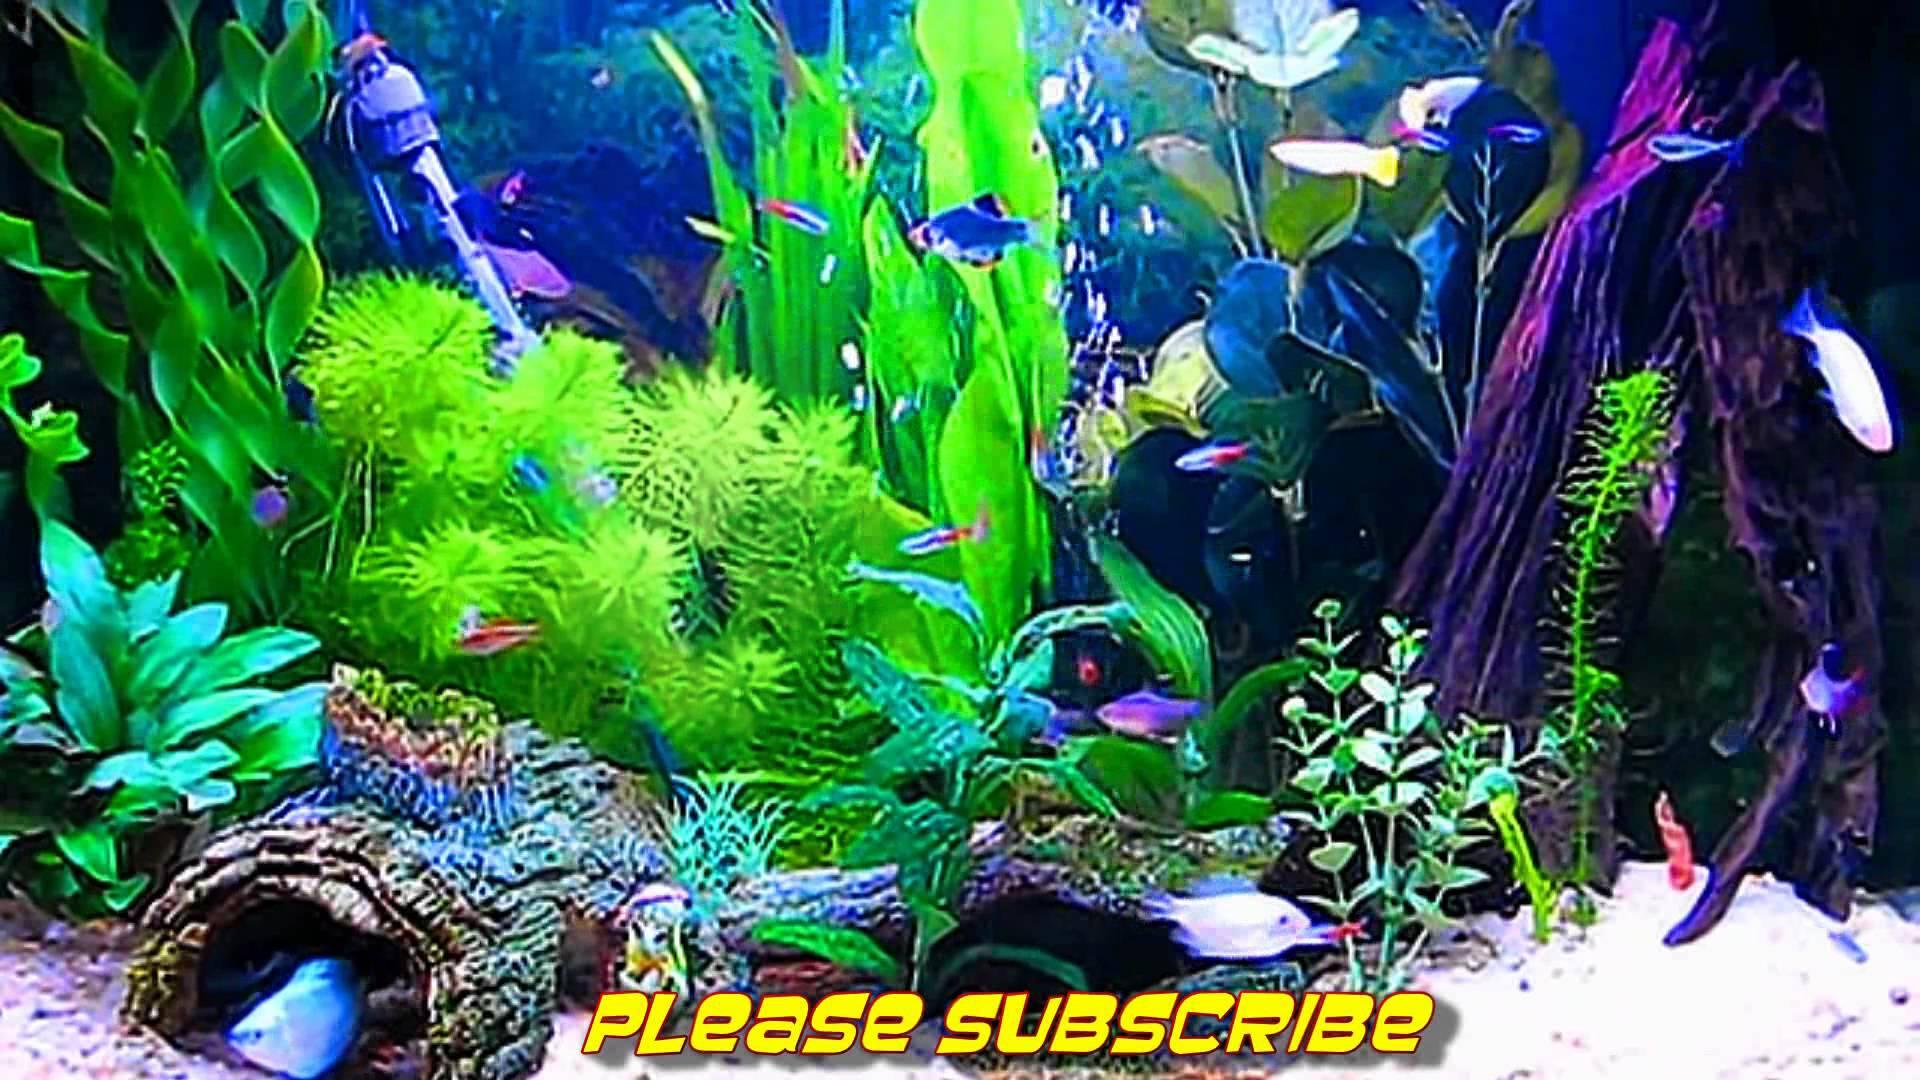 Fish aquarium live wallpaper for pc - Amazing Hd Aquarium Screensaver Free Windows And Android Youtube